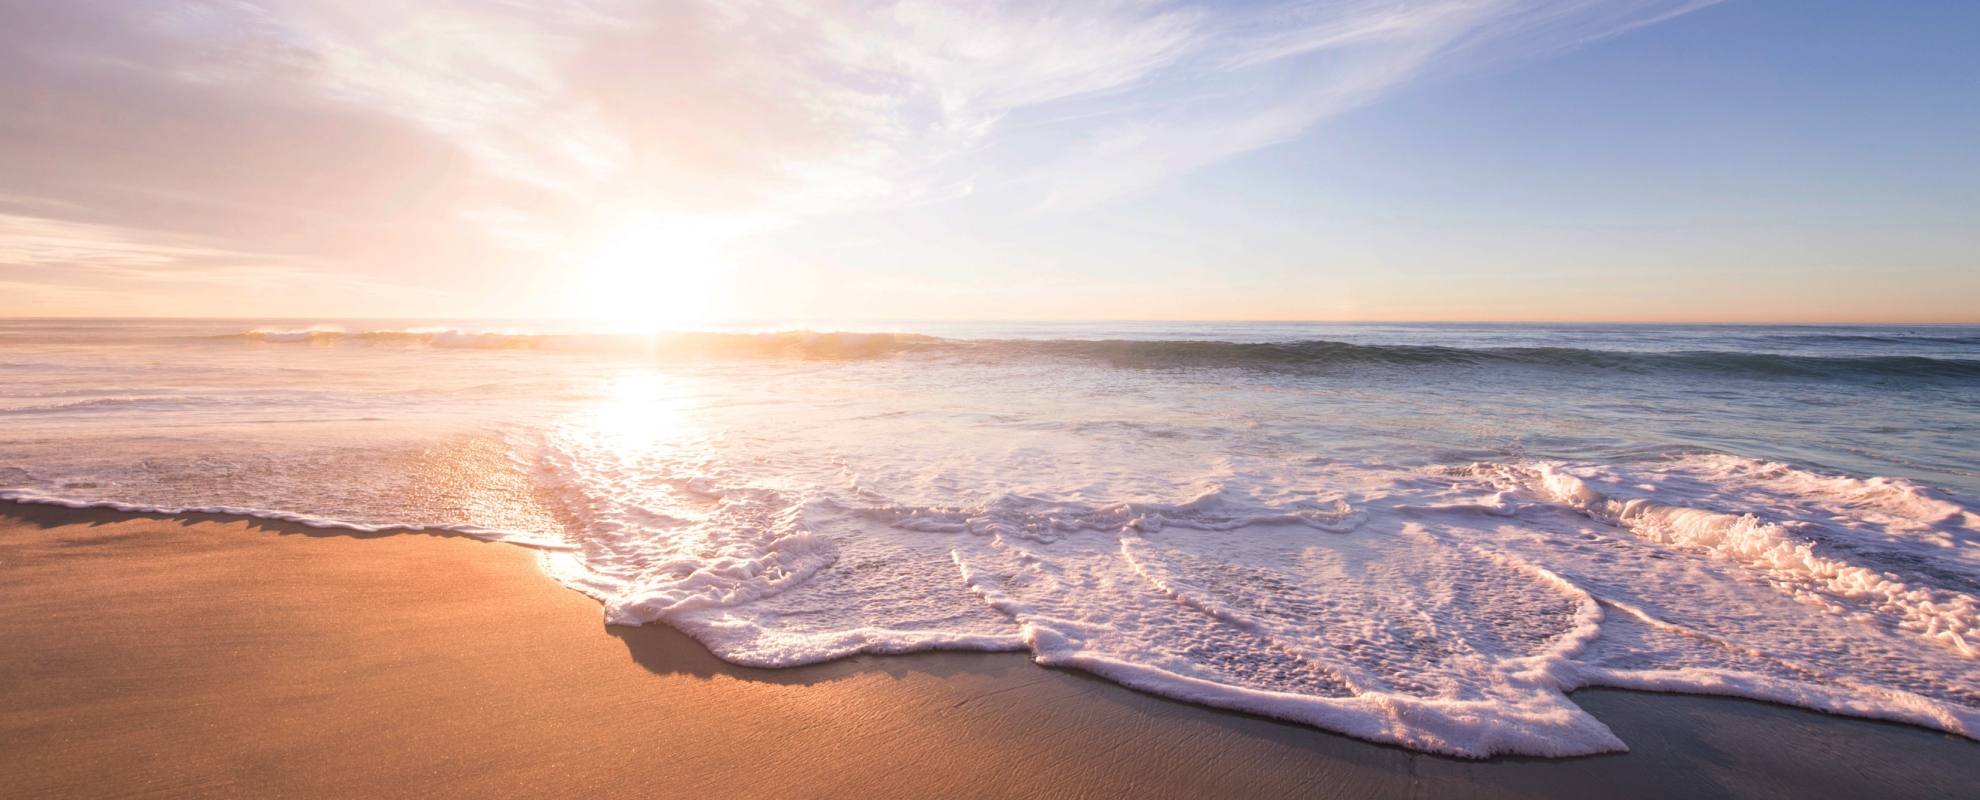 Willkommen am Meer Küstenglück